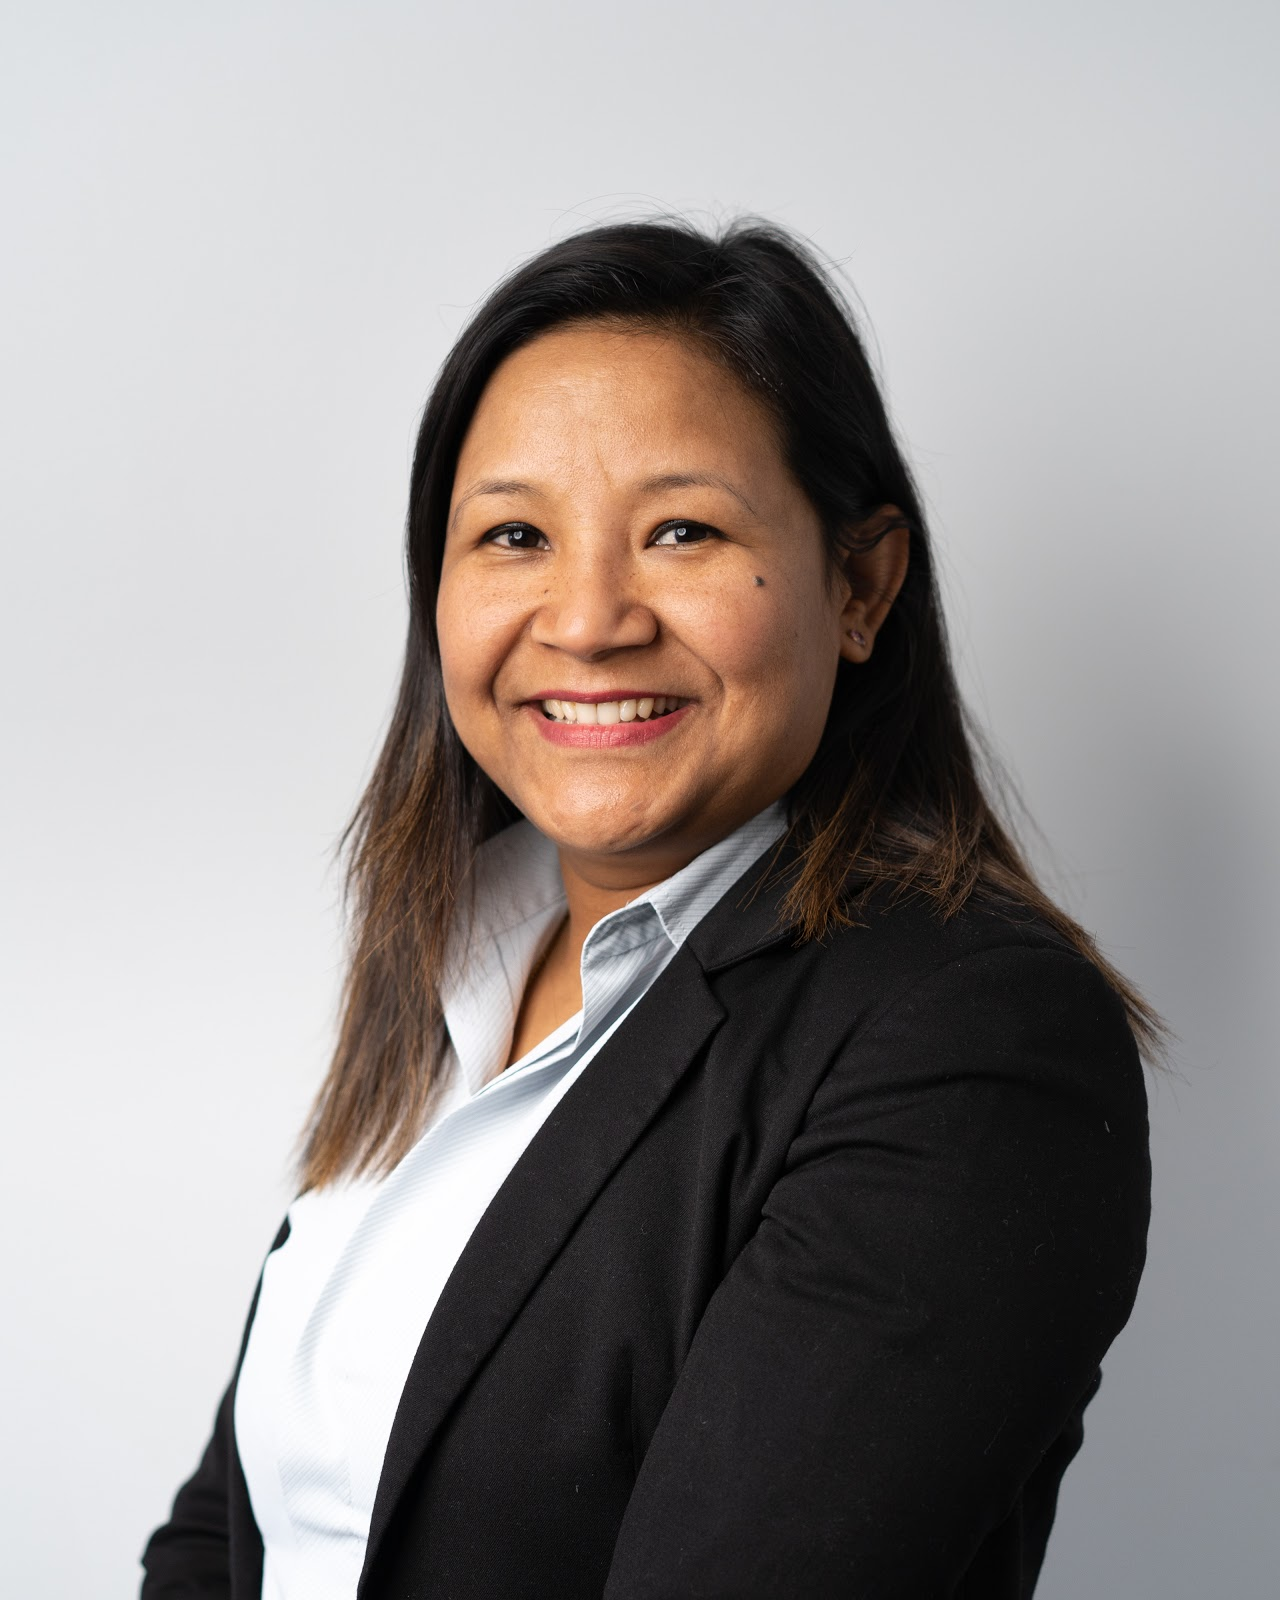 Asmita Shrestha